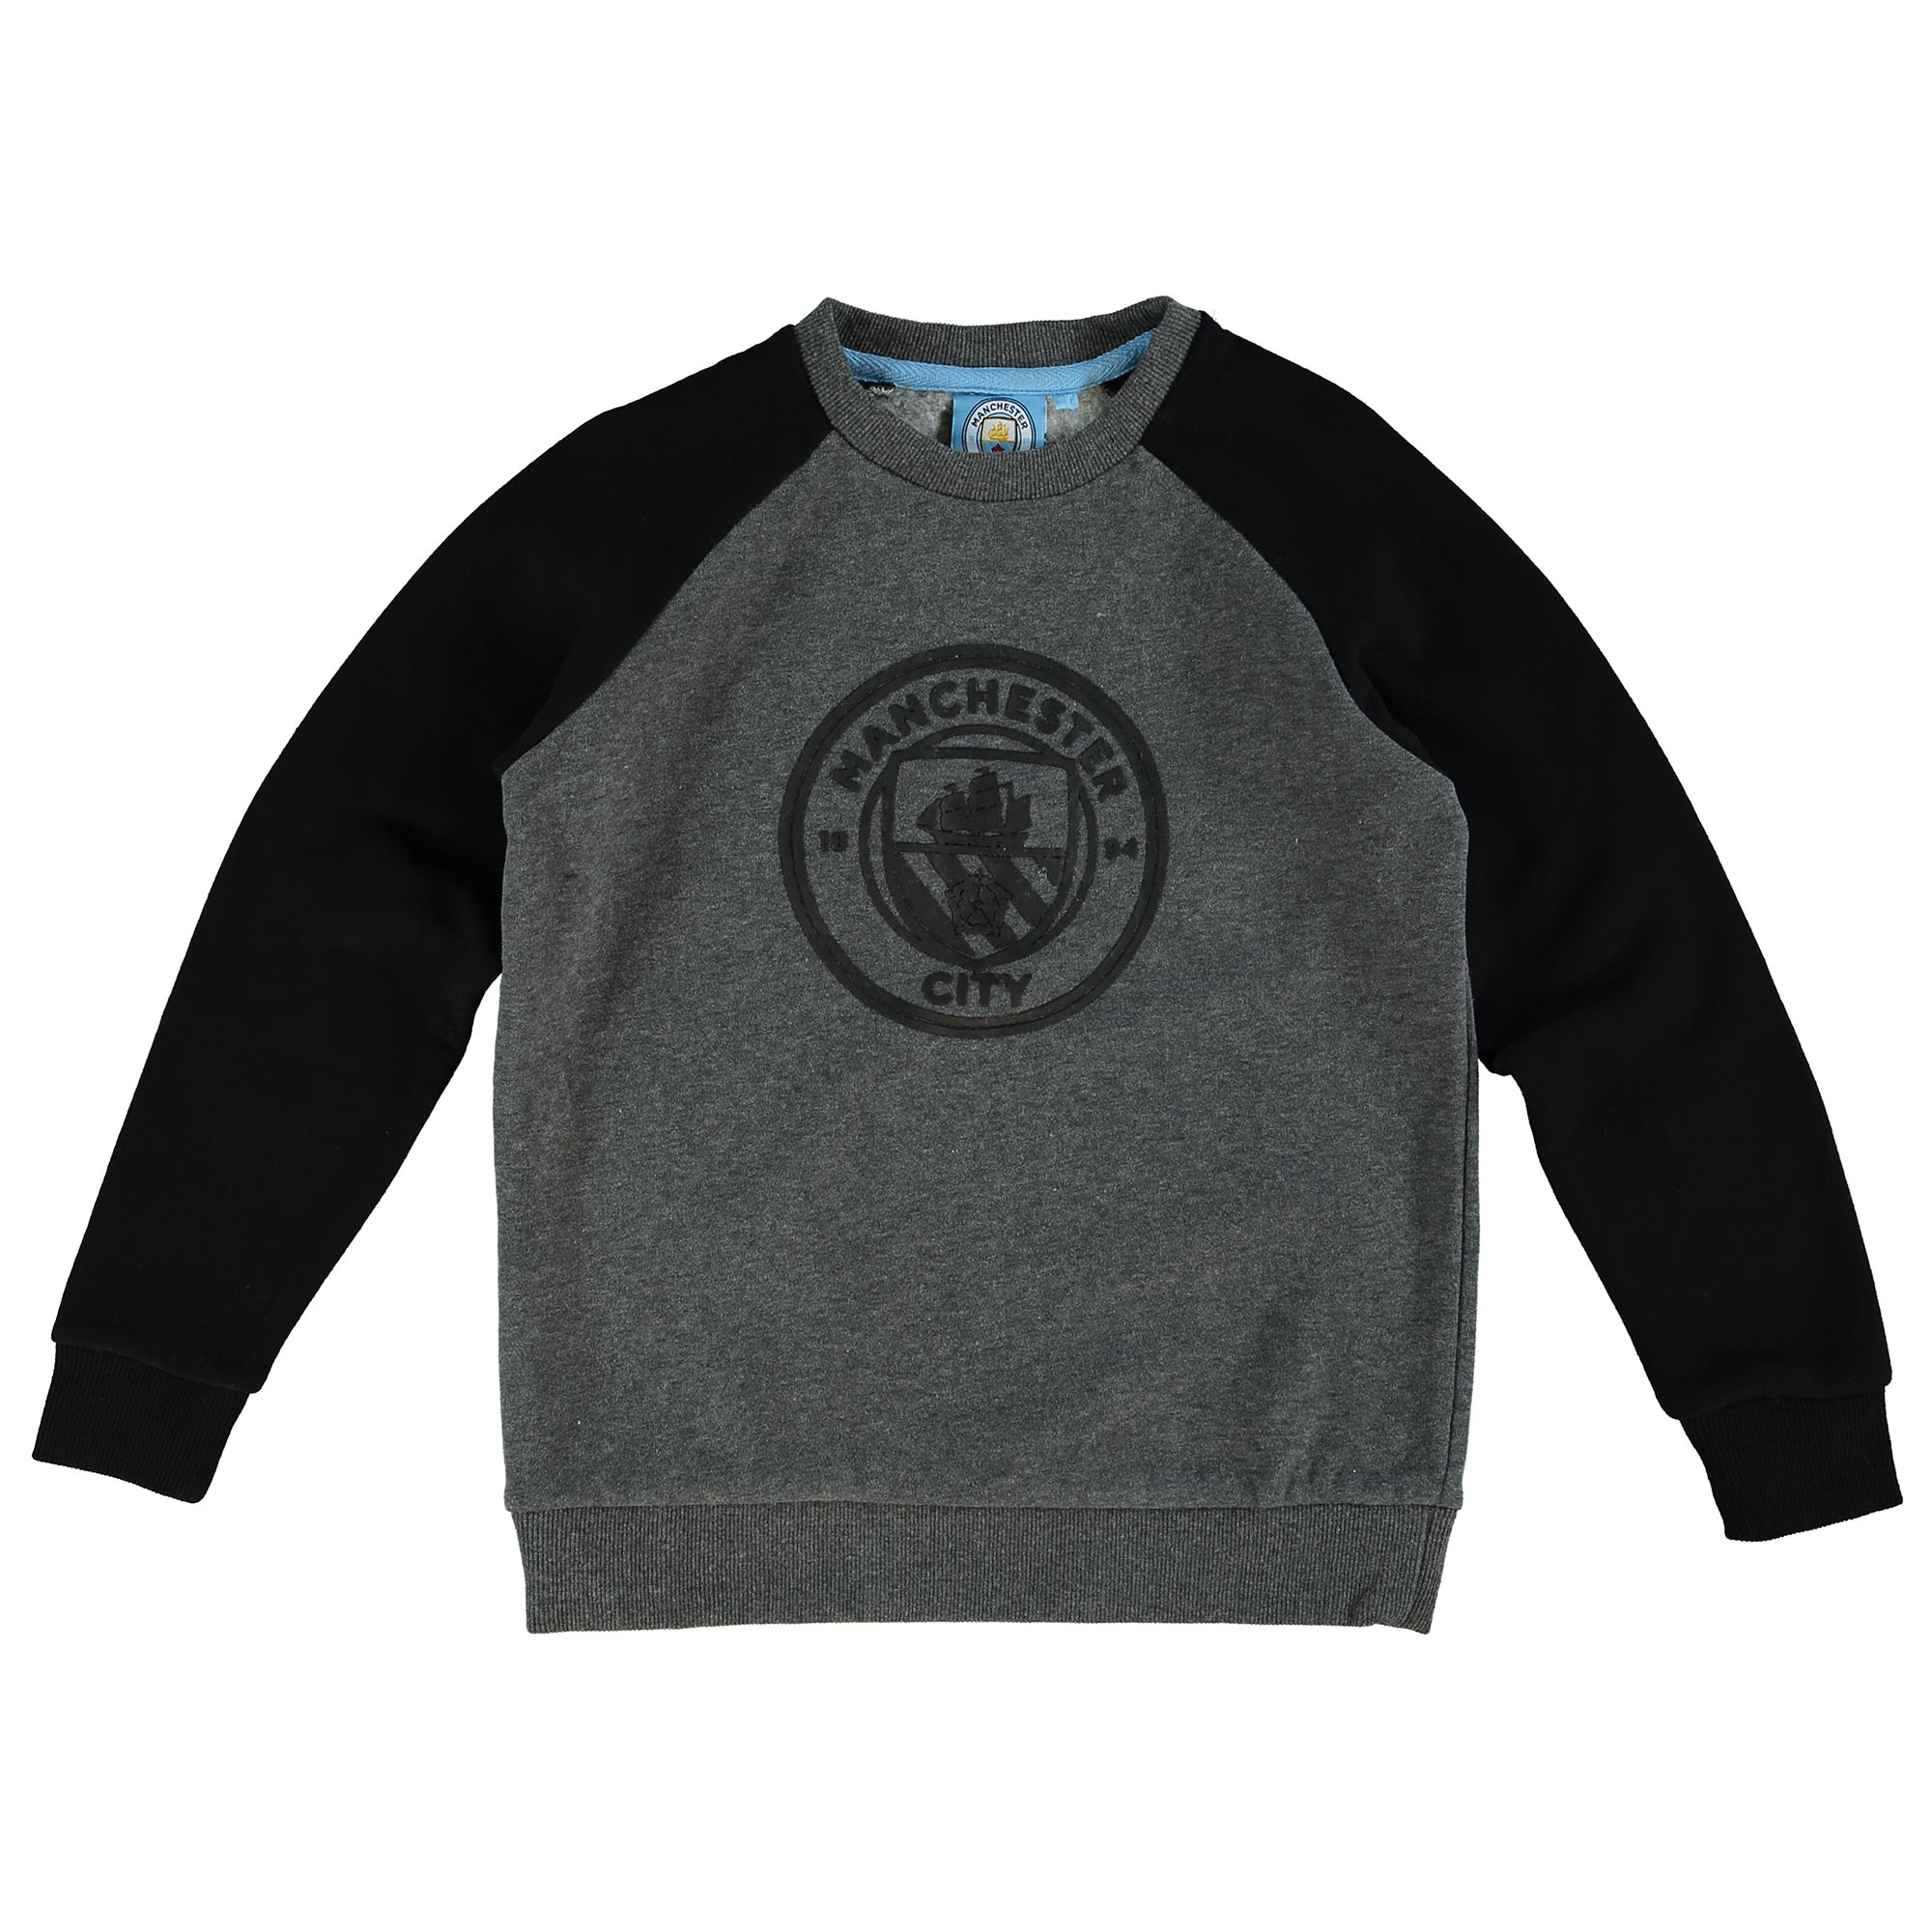 Manchester City Classic Raglan Sweatshirt - Grey/Black - Junior